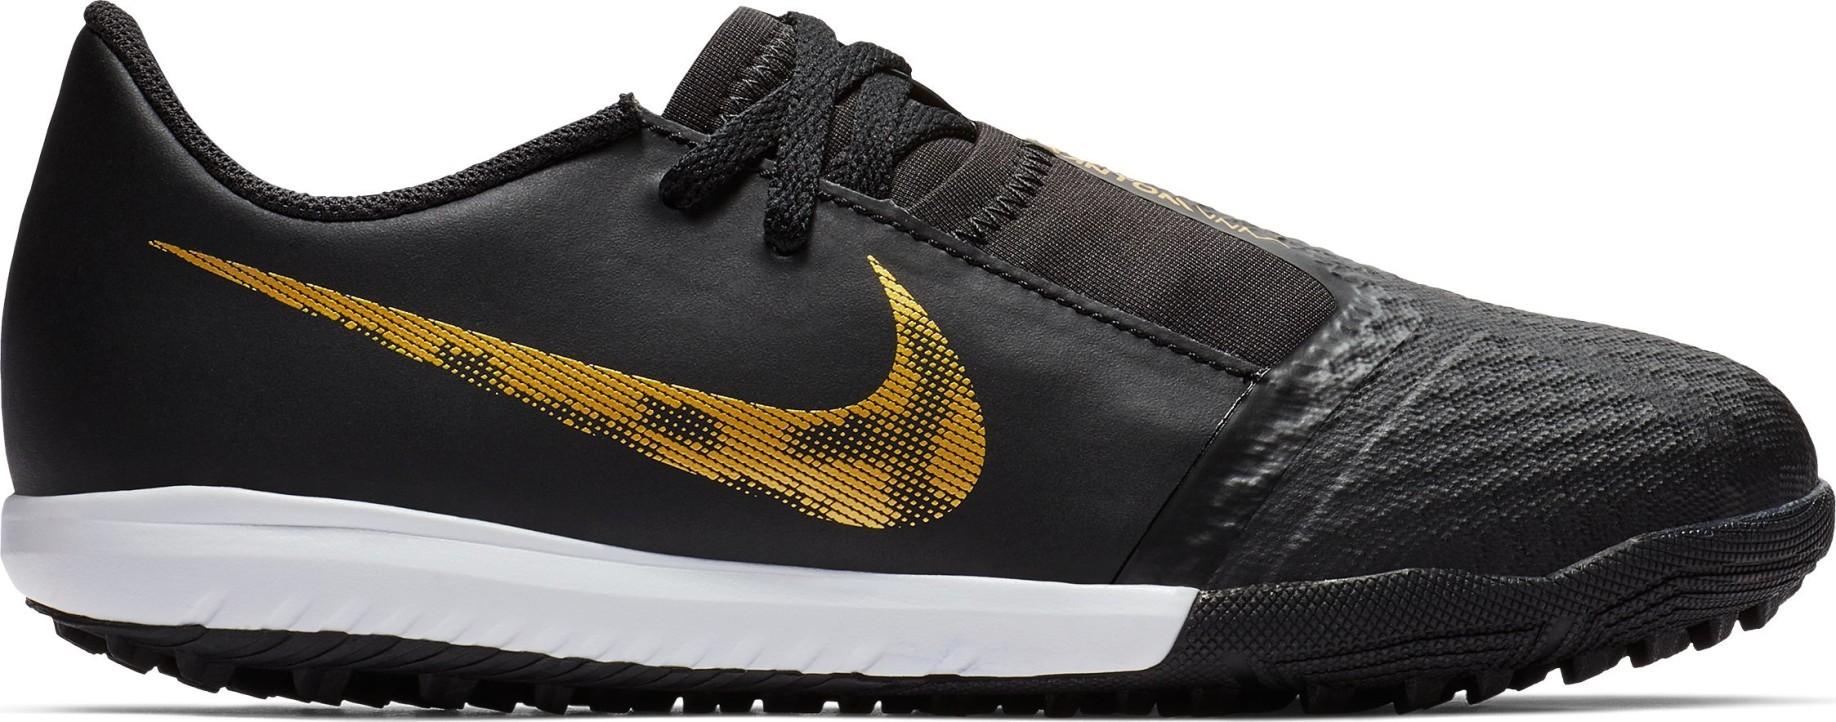 the best attitude 465b7 c8c1e Shoes Soccer Nike Phantom Venom Academy TF Black Lux Pack